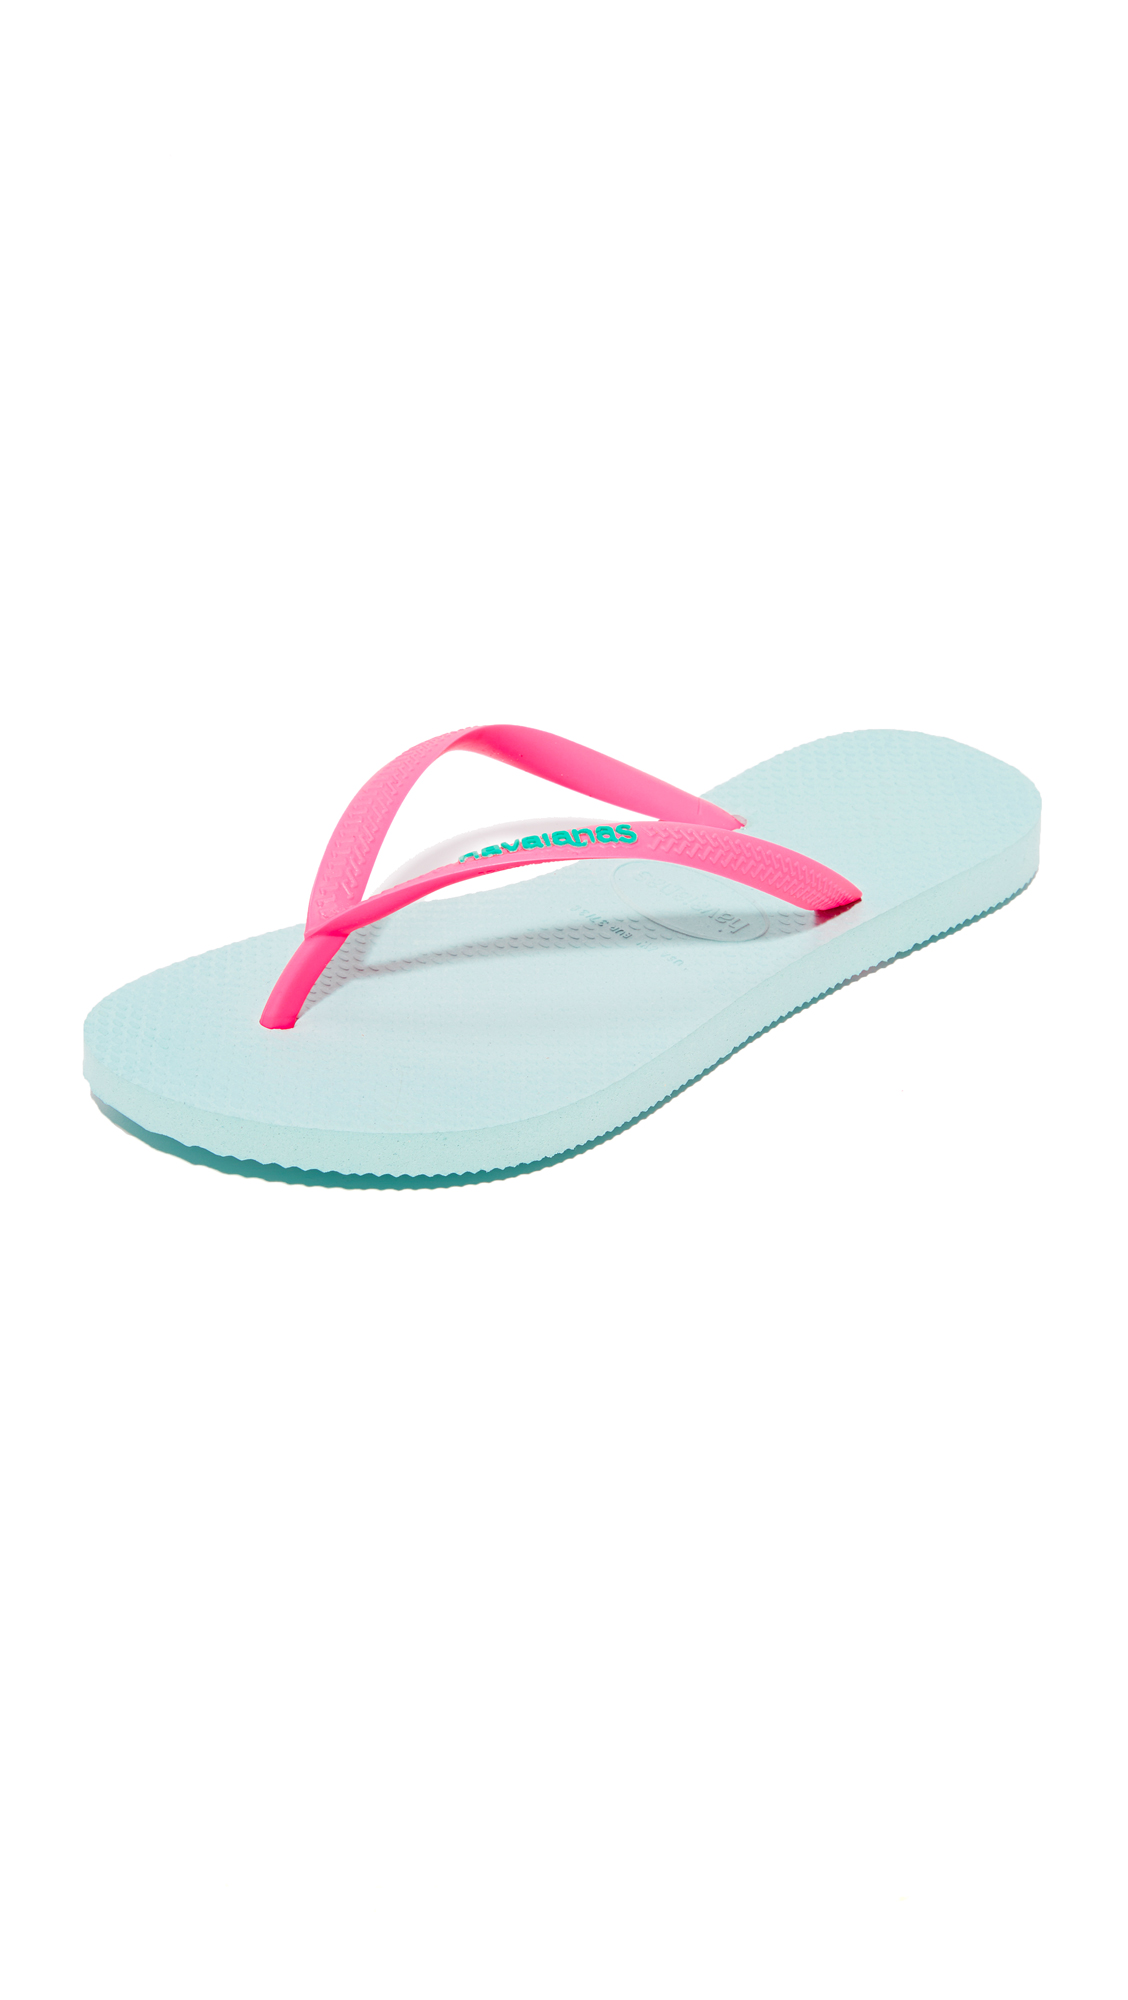 Havaianas Slim Logo Pop-Up Flip Flops - Mentha Green at Shopbop